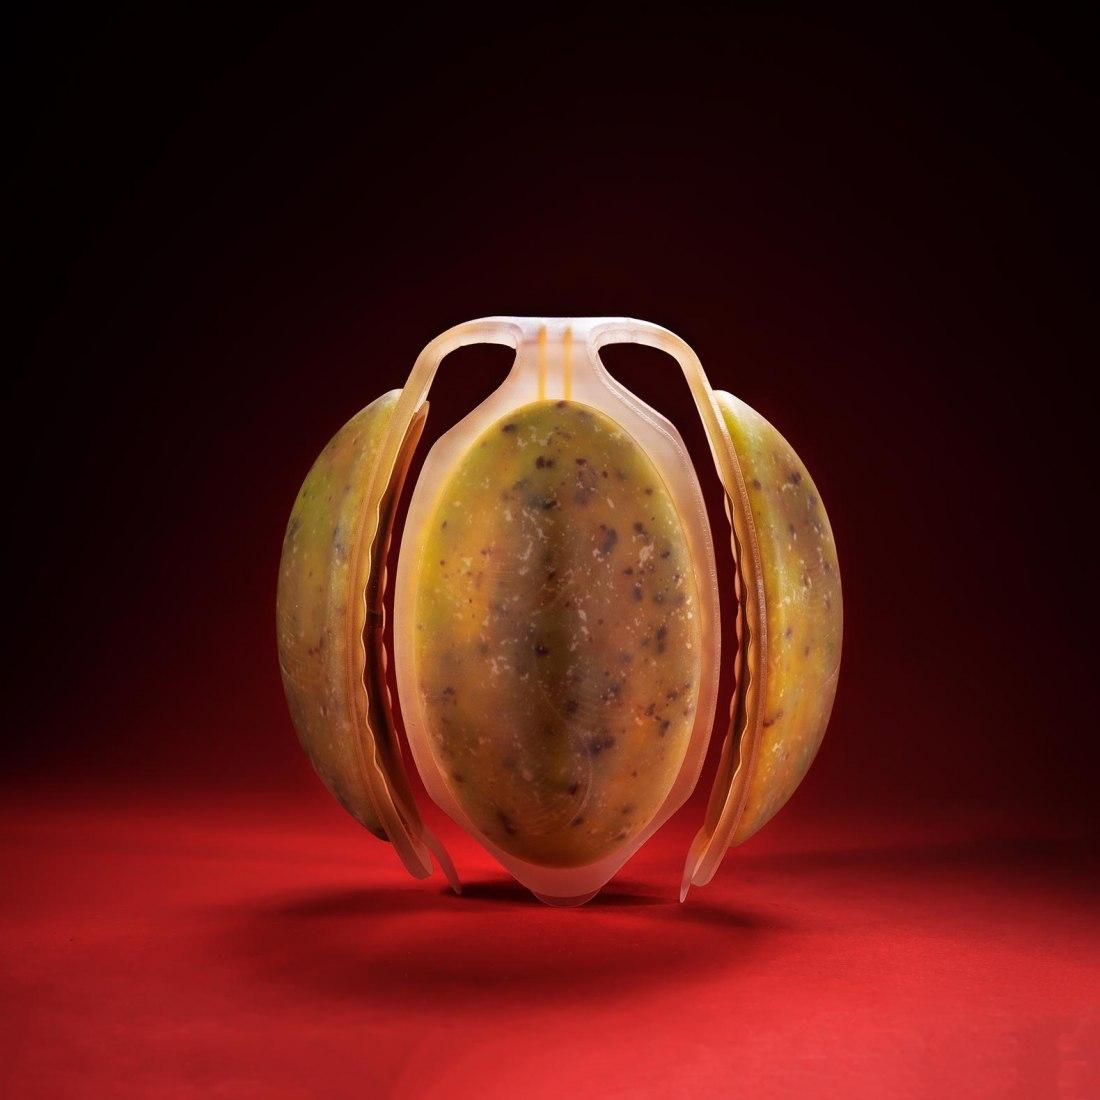 Neo Fruit by Meydan Levy. Photograph by Bogdan Sokol & Shay Maman